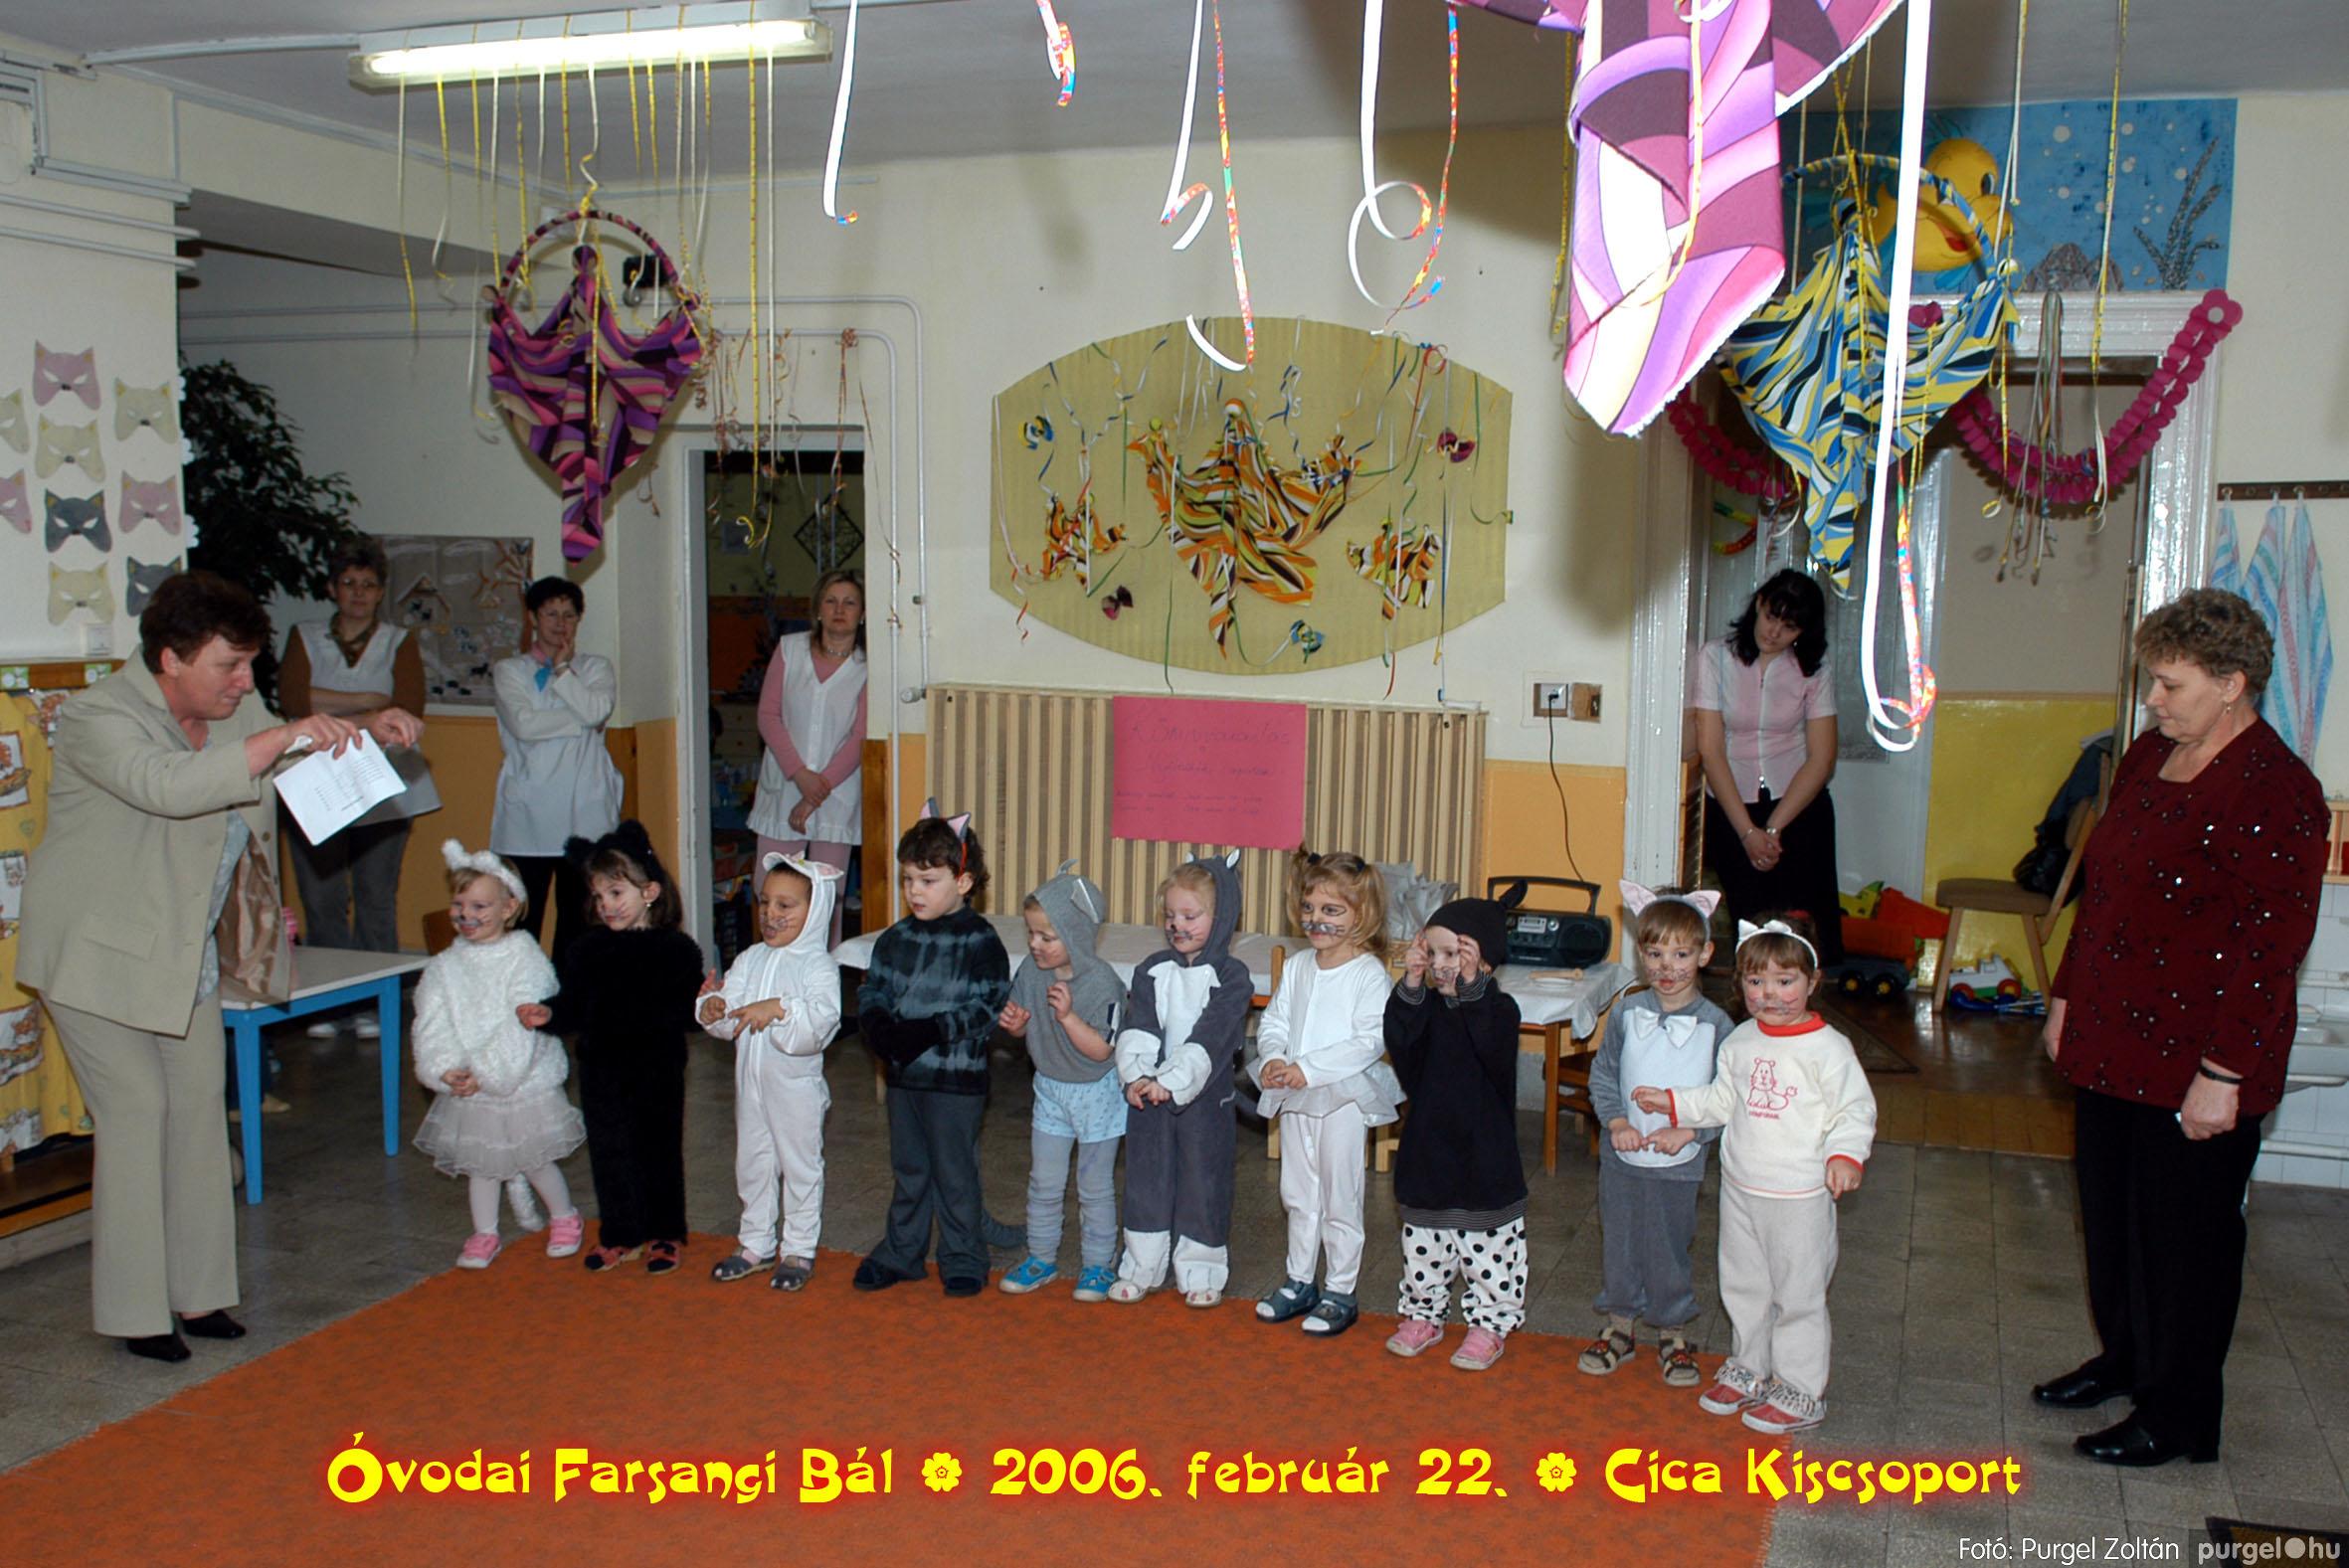 2006.02.22. 017 Kurca-parti Óvoda farsang 2006. - Cica csoport - Fotó:PURGEL ZOLTÁN© 717.jpg